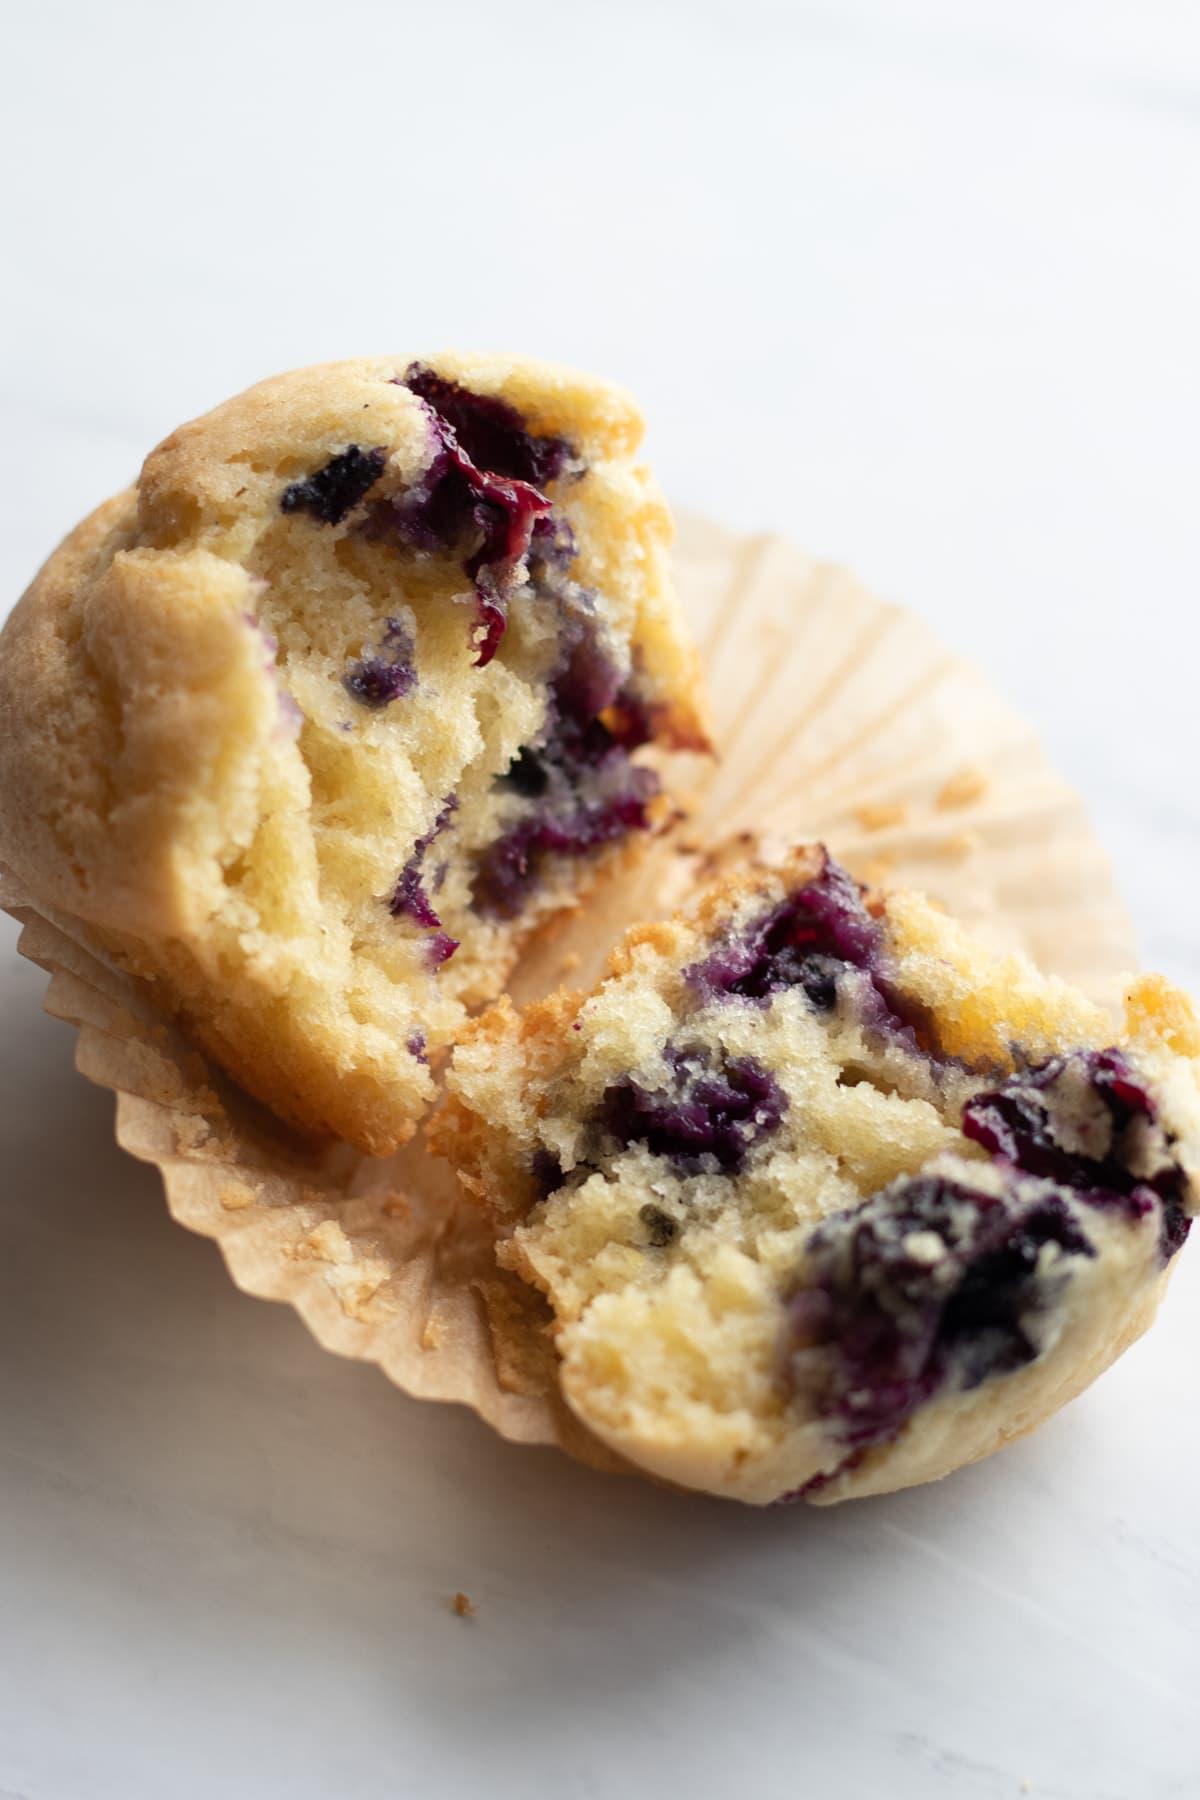 A low FODMAP blueberry muffin broken in half.